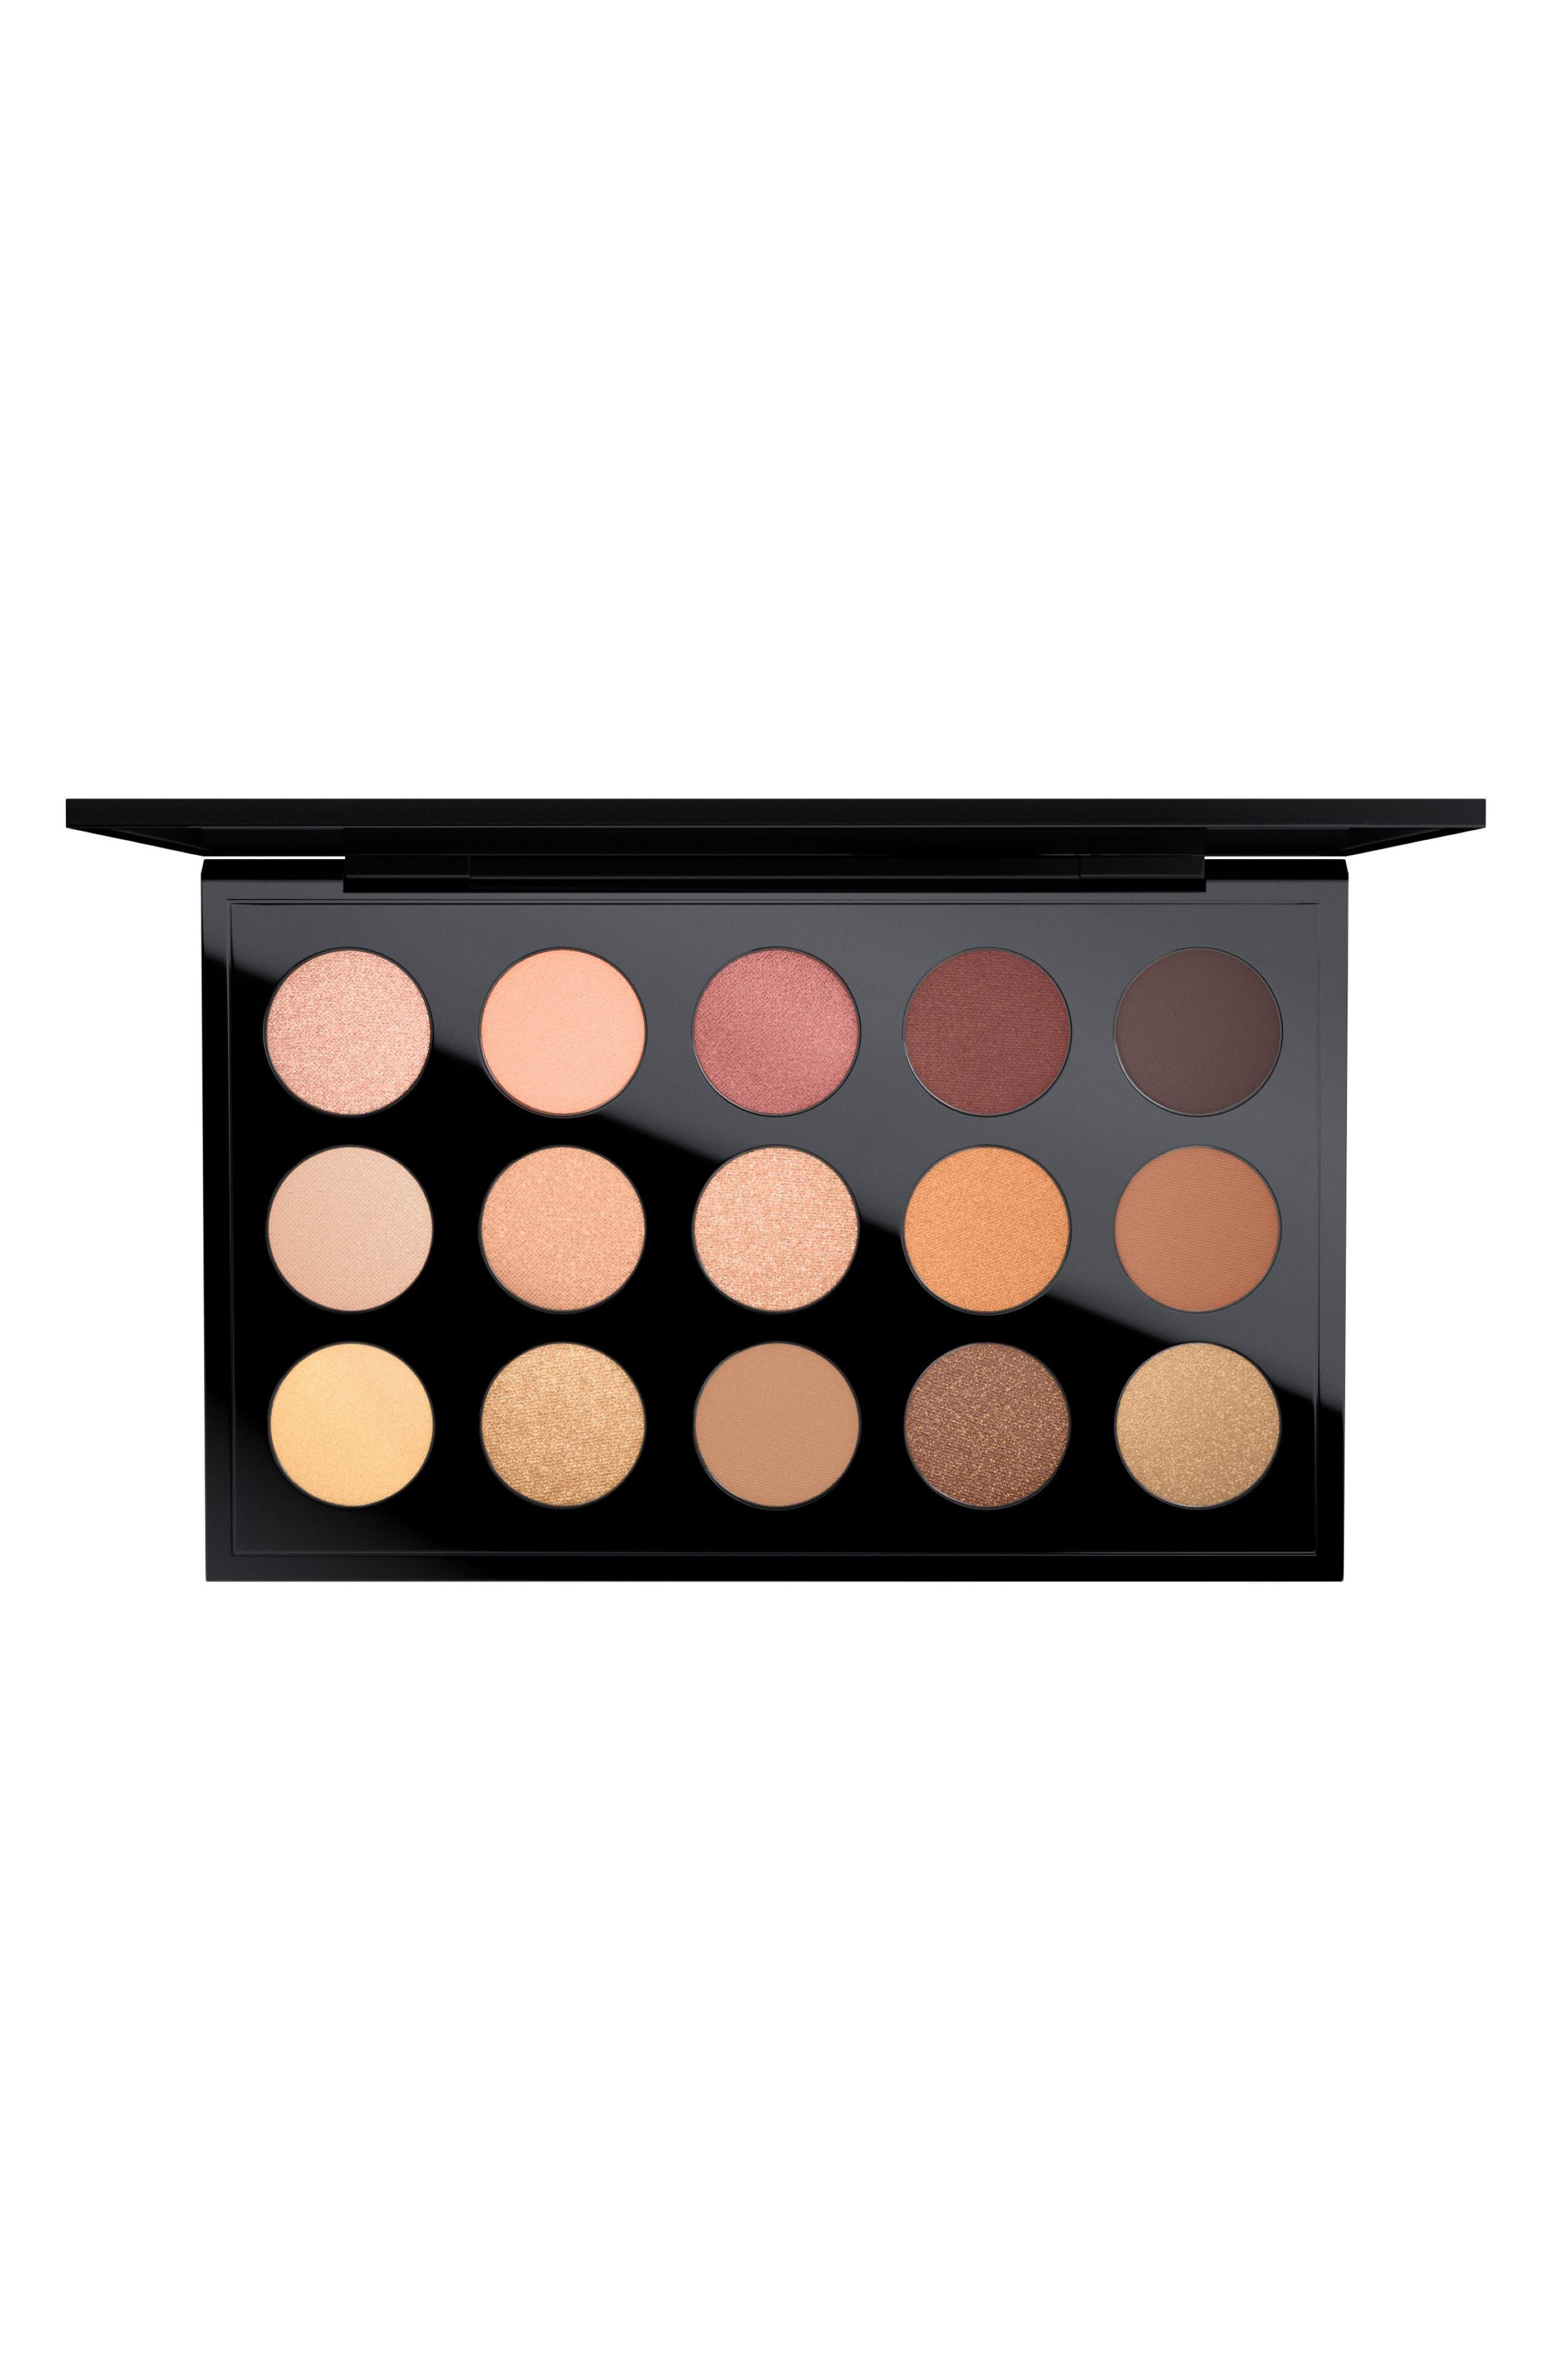 MAC Cool Neutral Times 15 Eyeshadow Palette,                         Main,                         color, 200